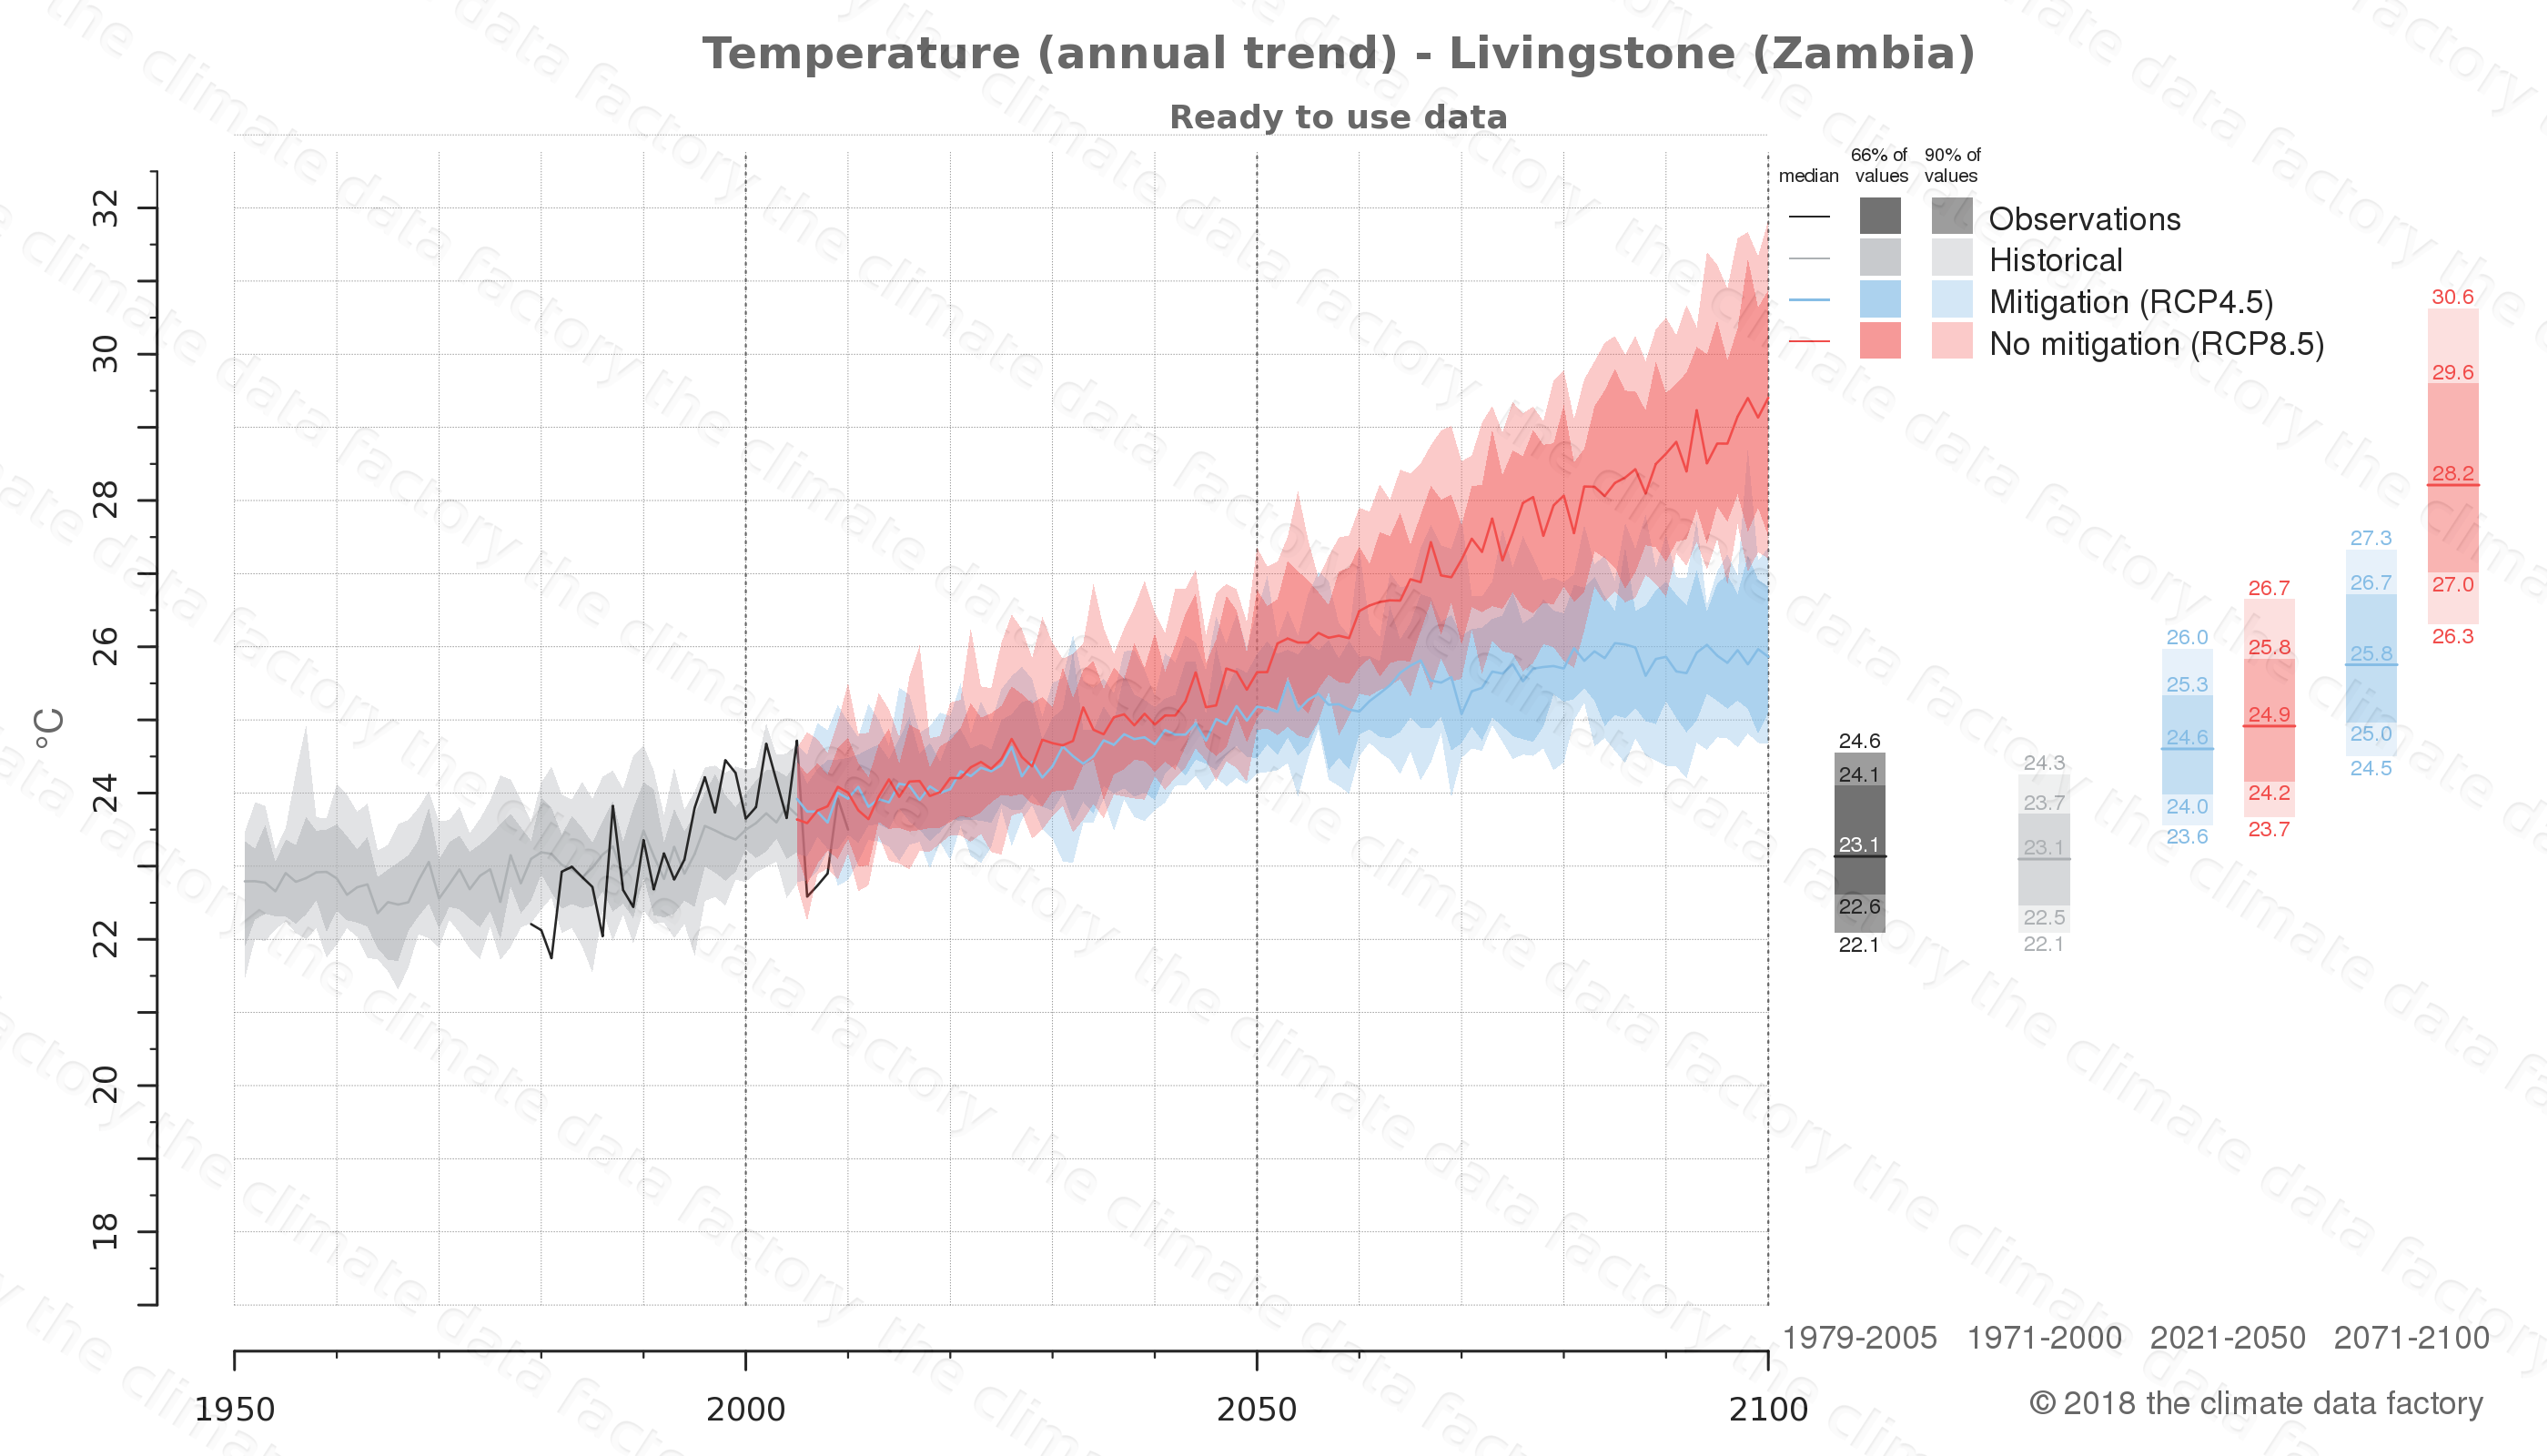 climate change data policy adaptation climate graph city data temperature livingstone zambia